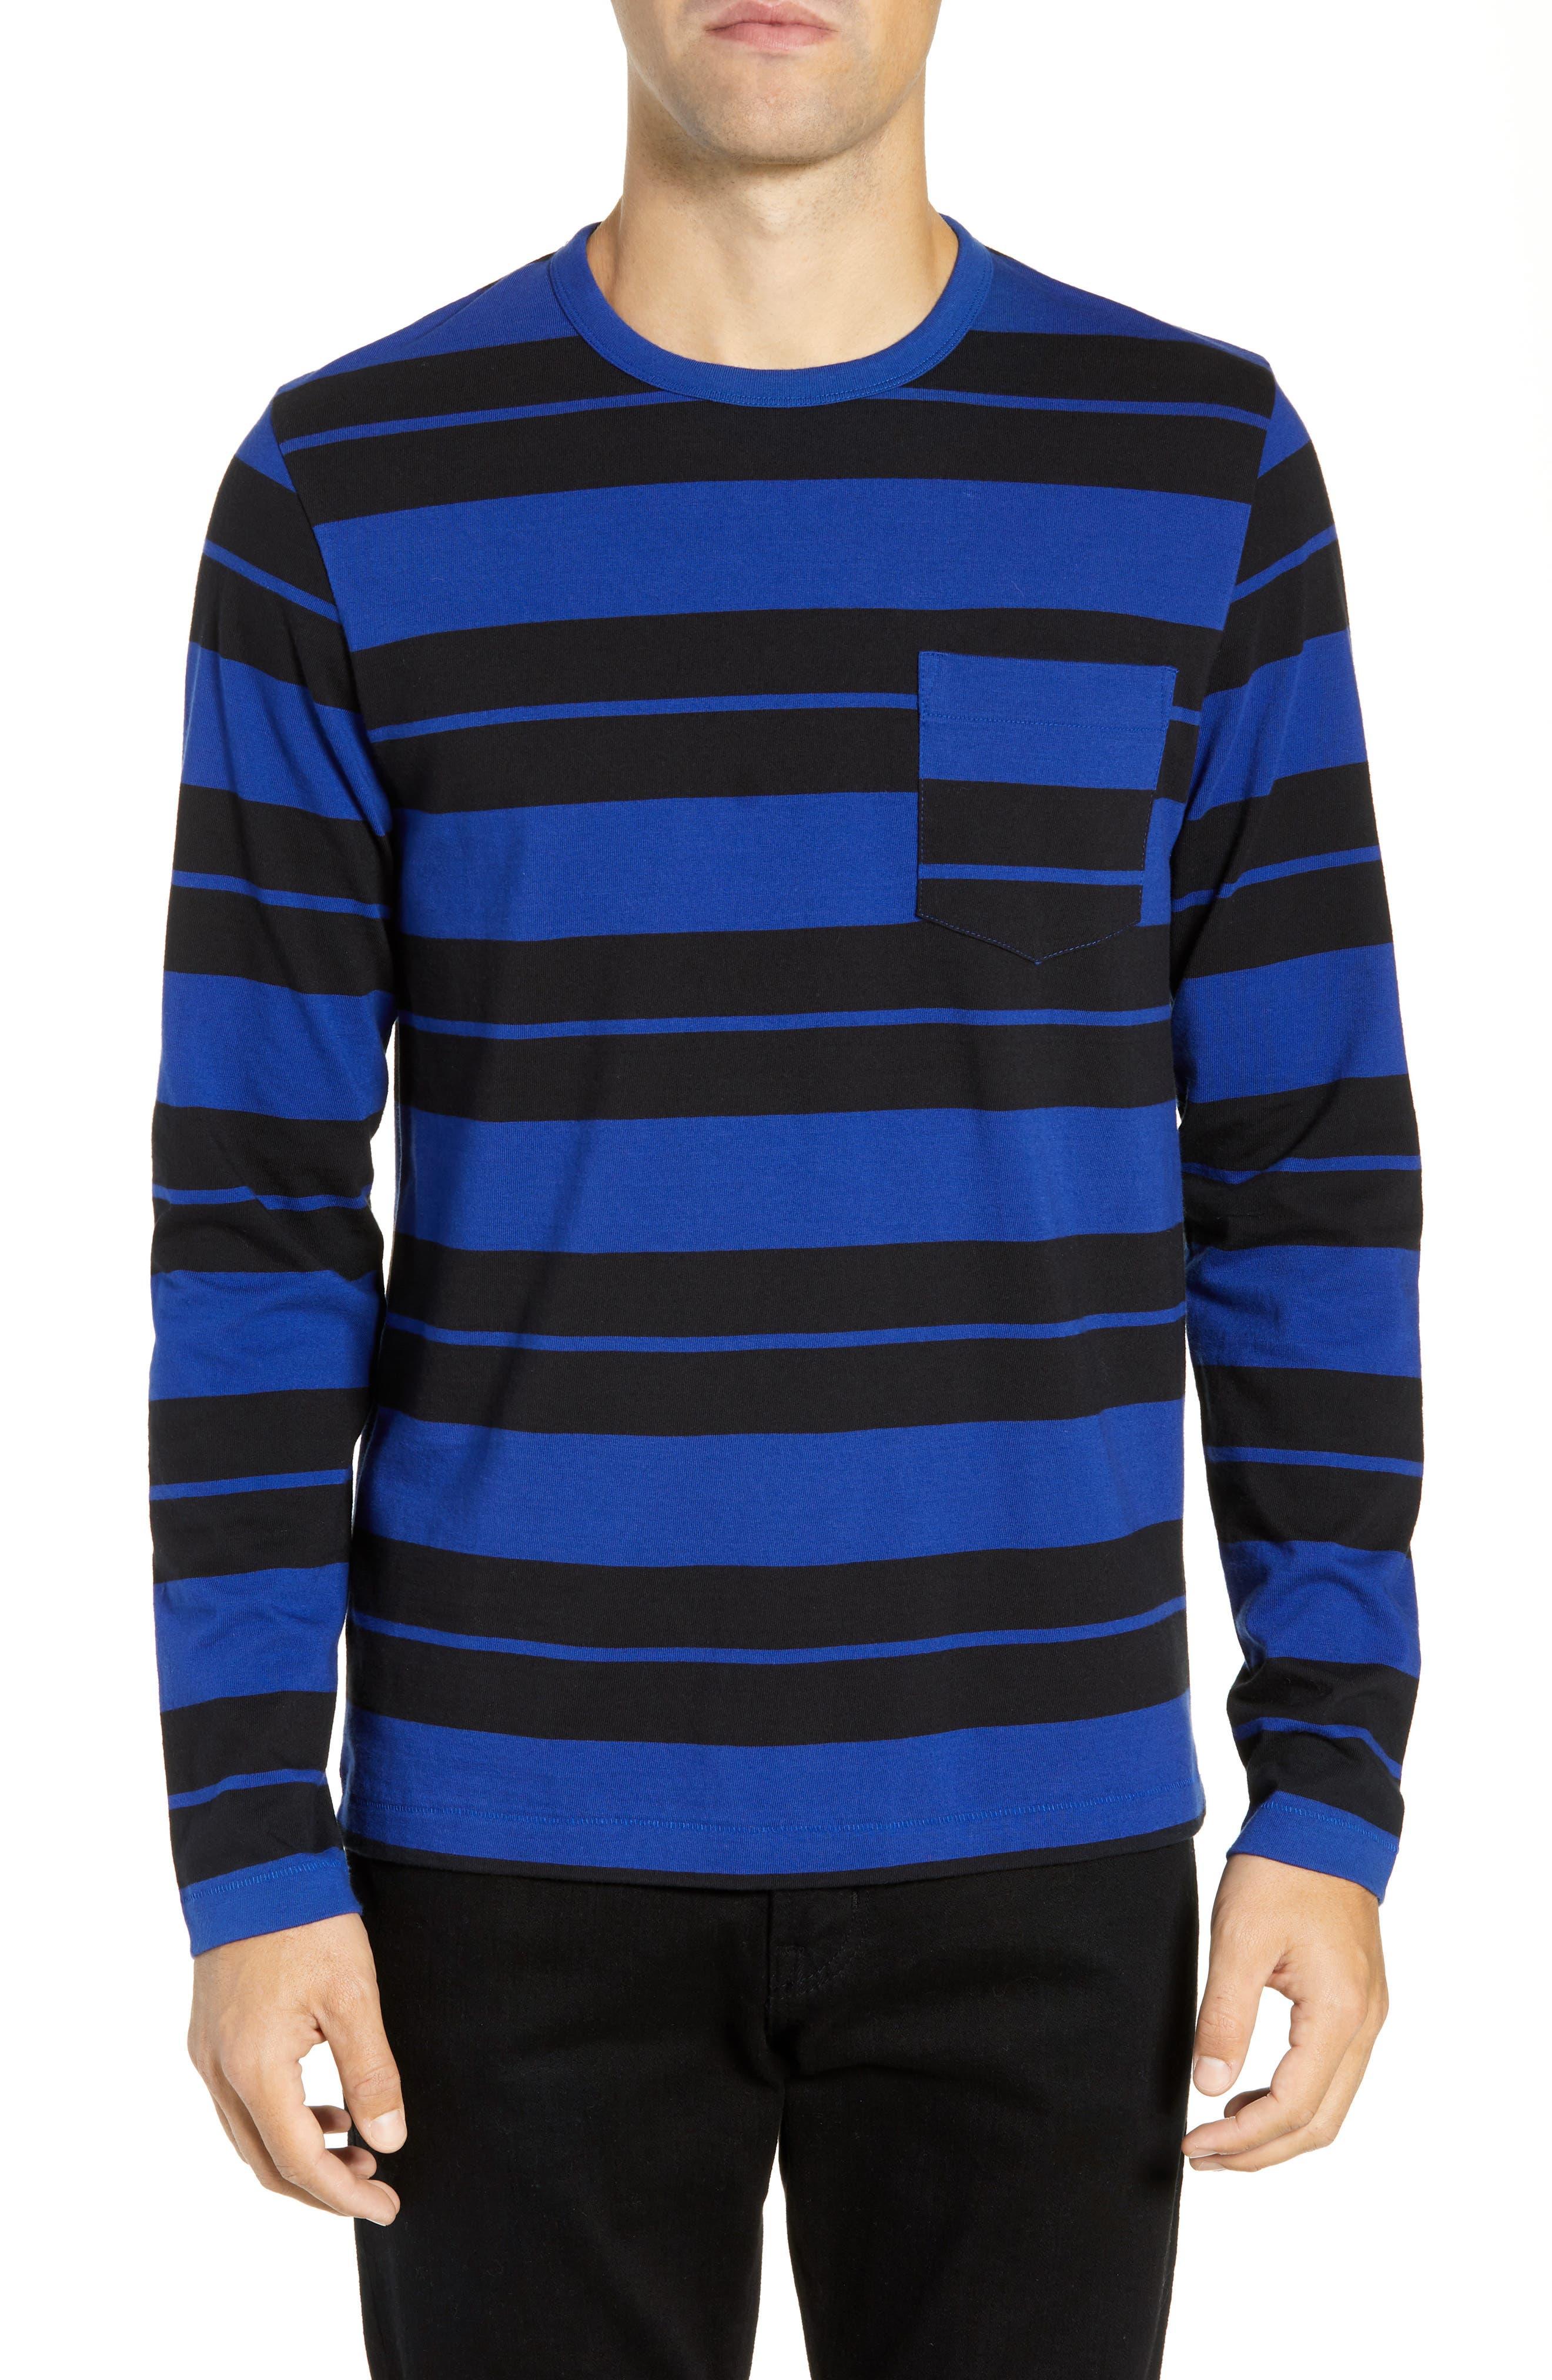 French Connection Fran Varsity Stripe Regular Fit T-Shirt, Blue